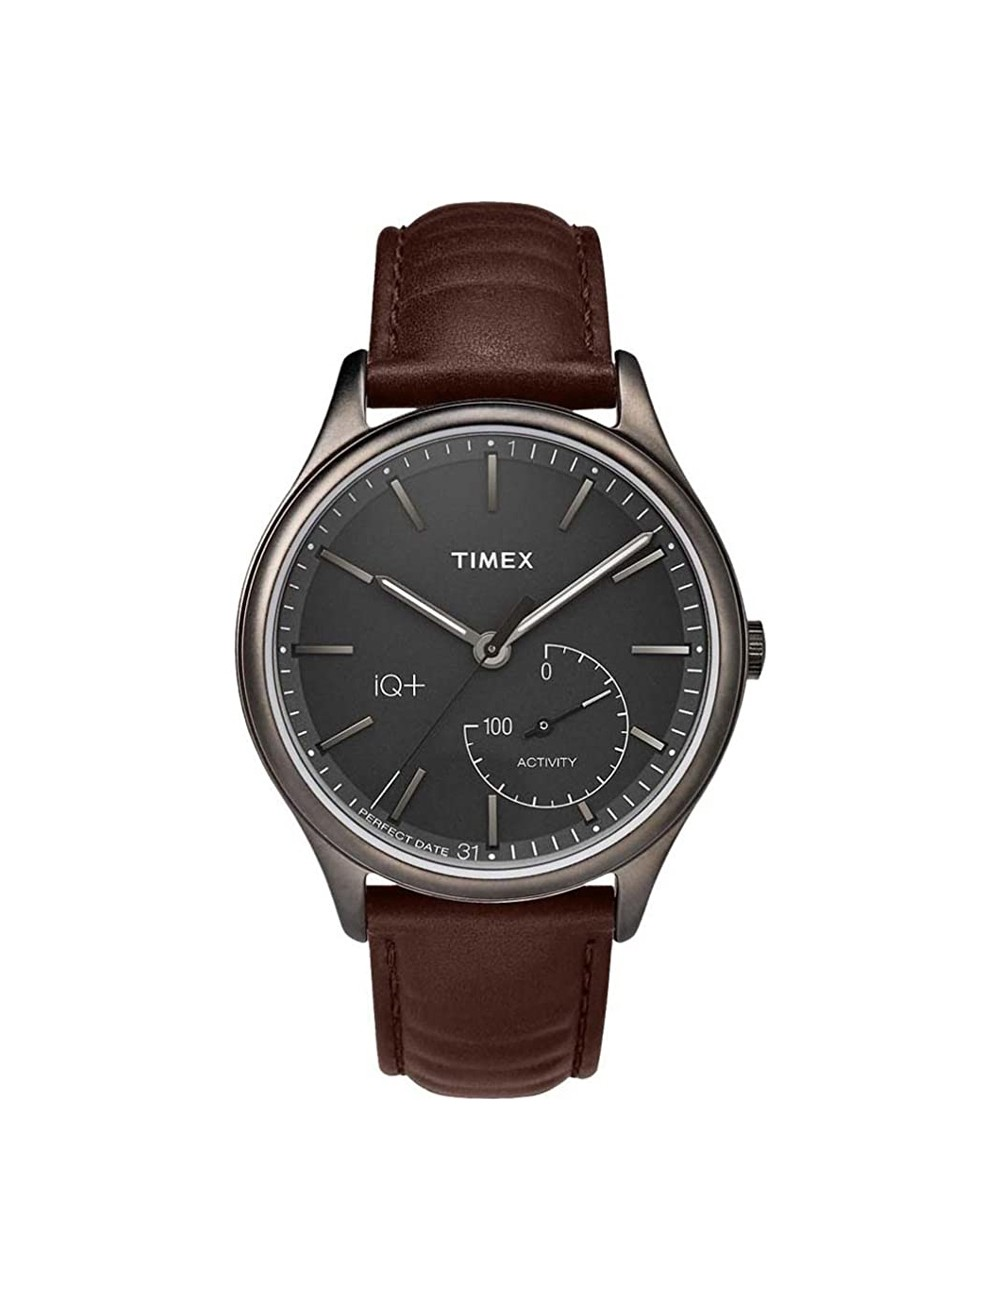 Timex IQ+ Move Smartwatch TW2P94800 Mens Watch